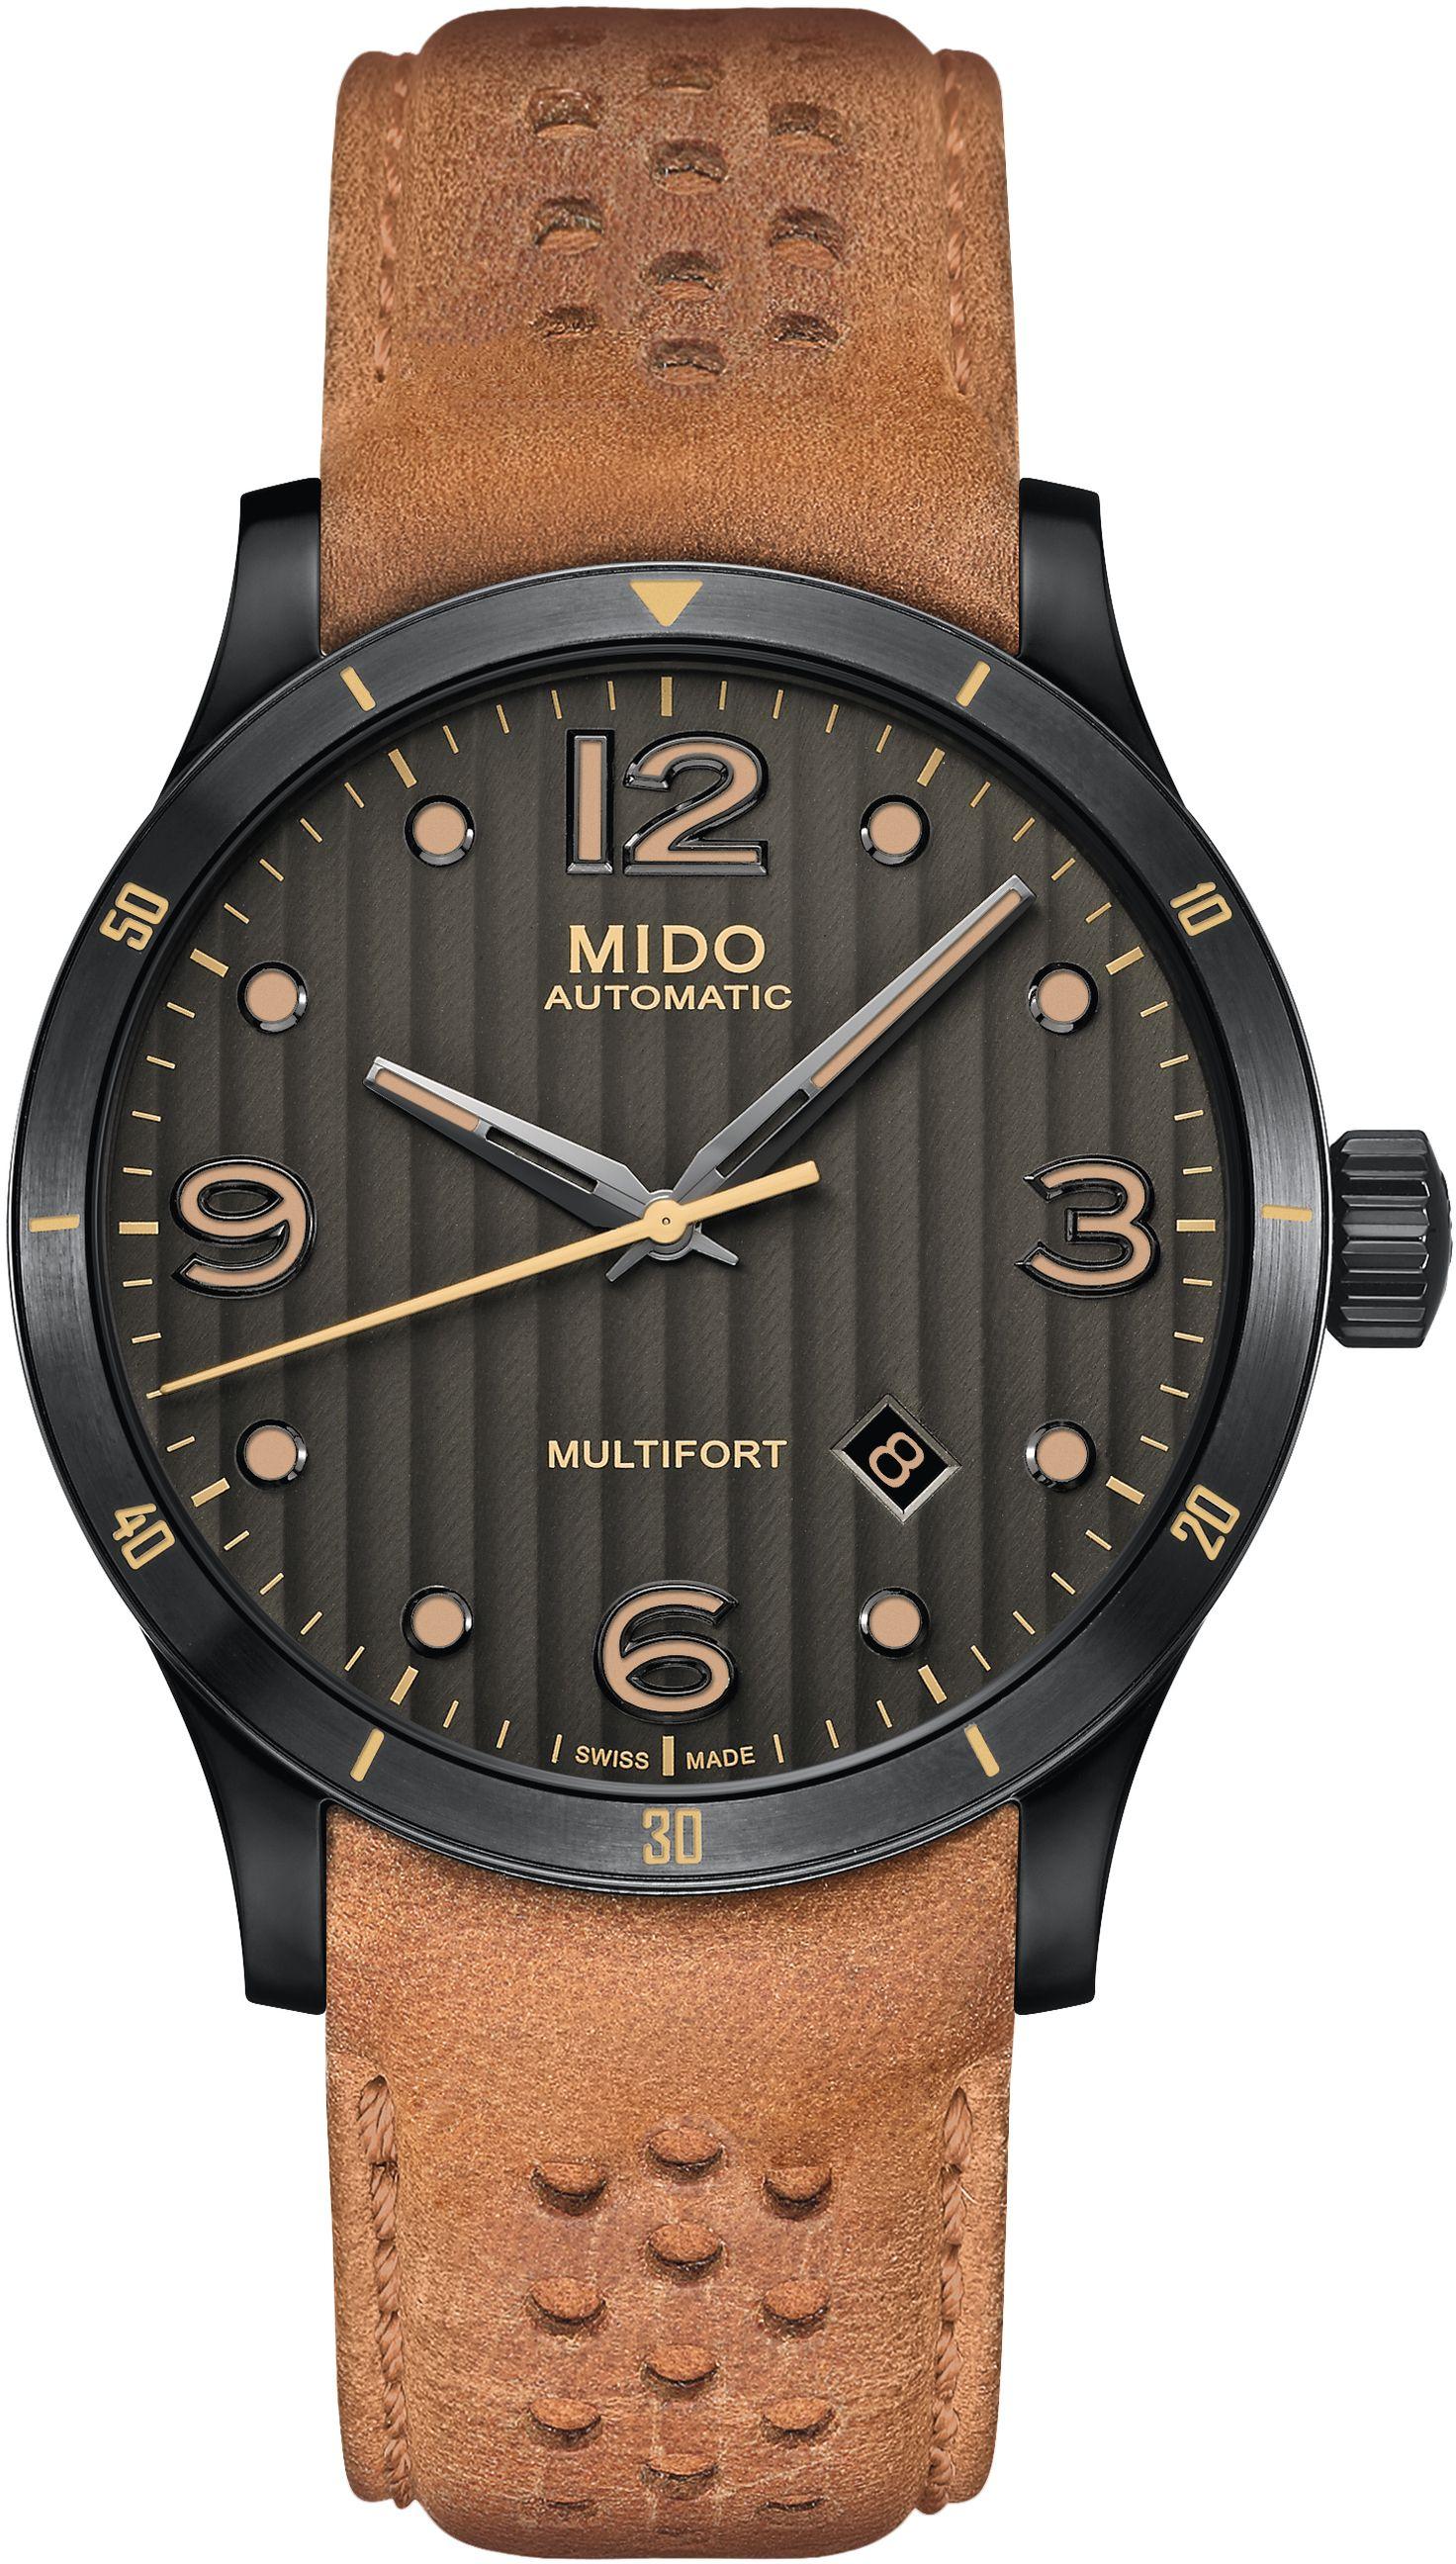 Mido 10 Multifort Automatique HommeM025 36 061 407 Montre eW2IYD9EH